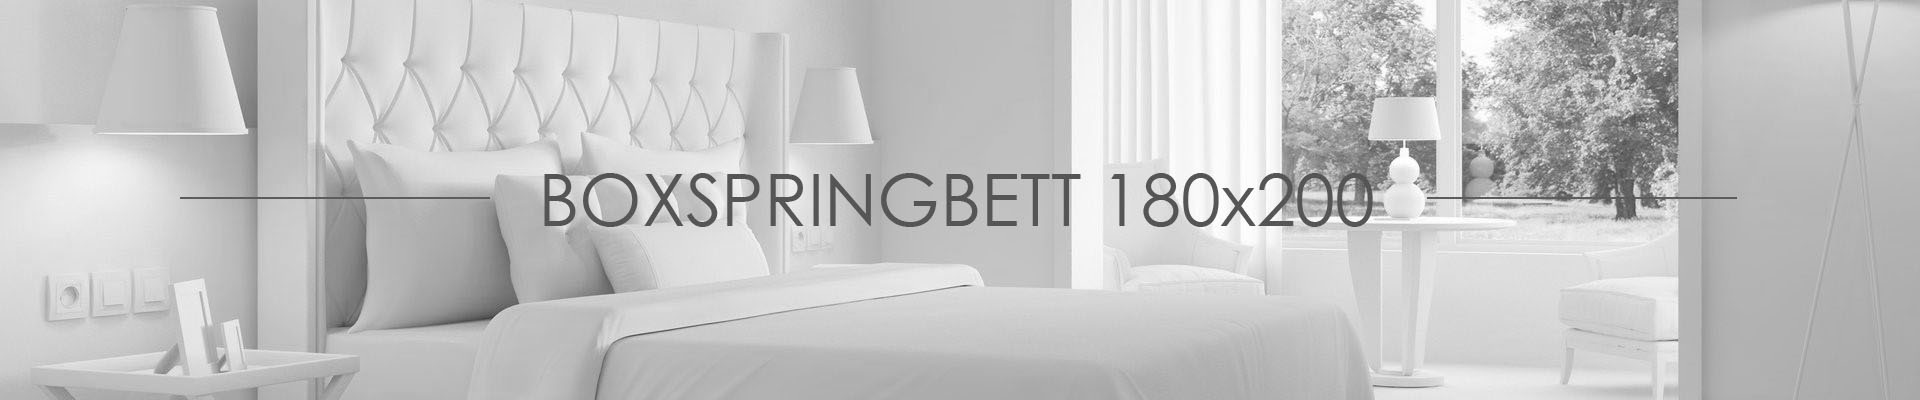 Boxspringbett 180x200